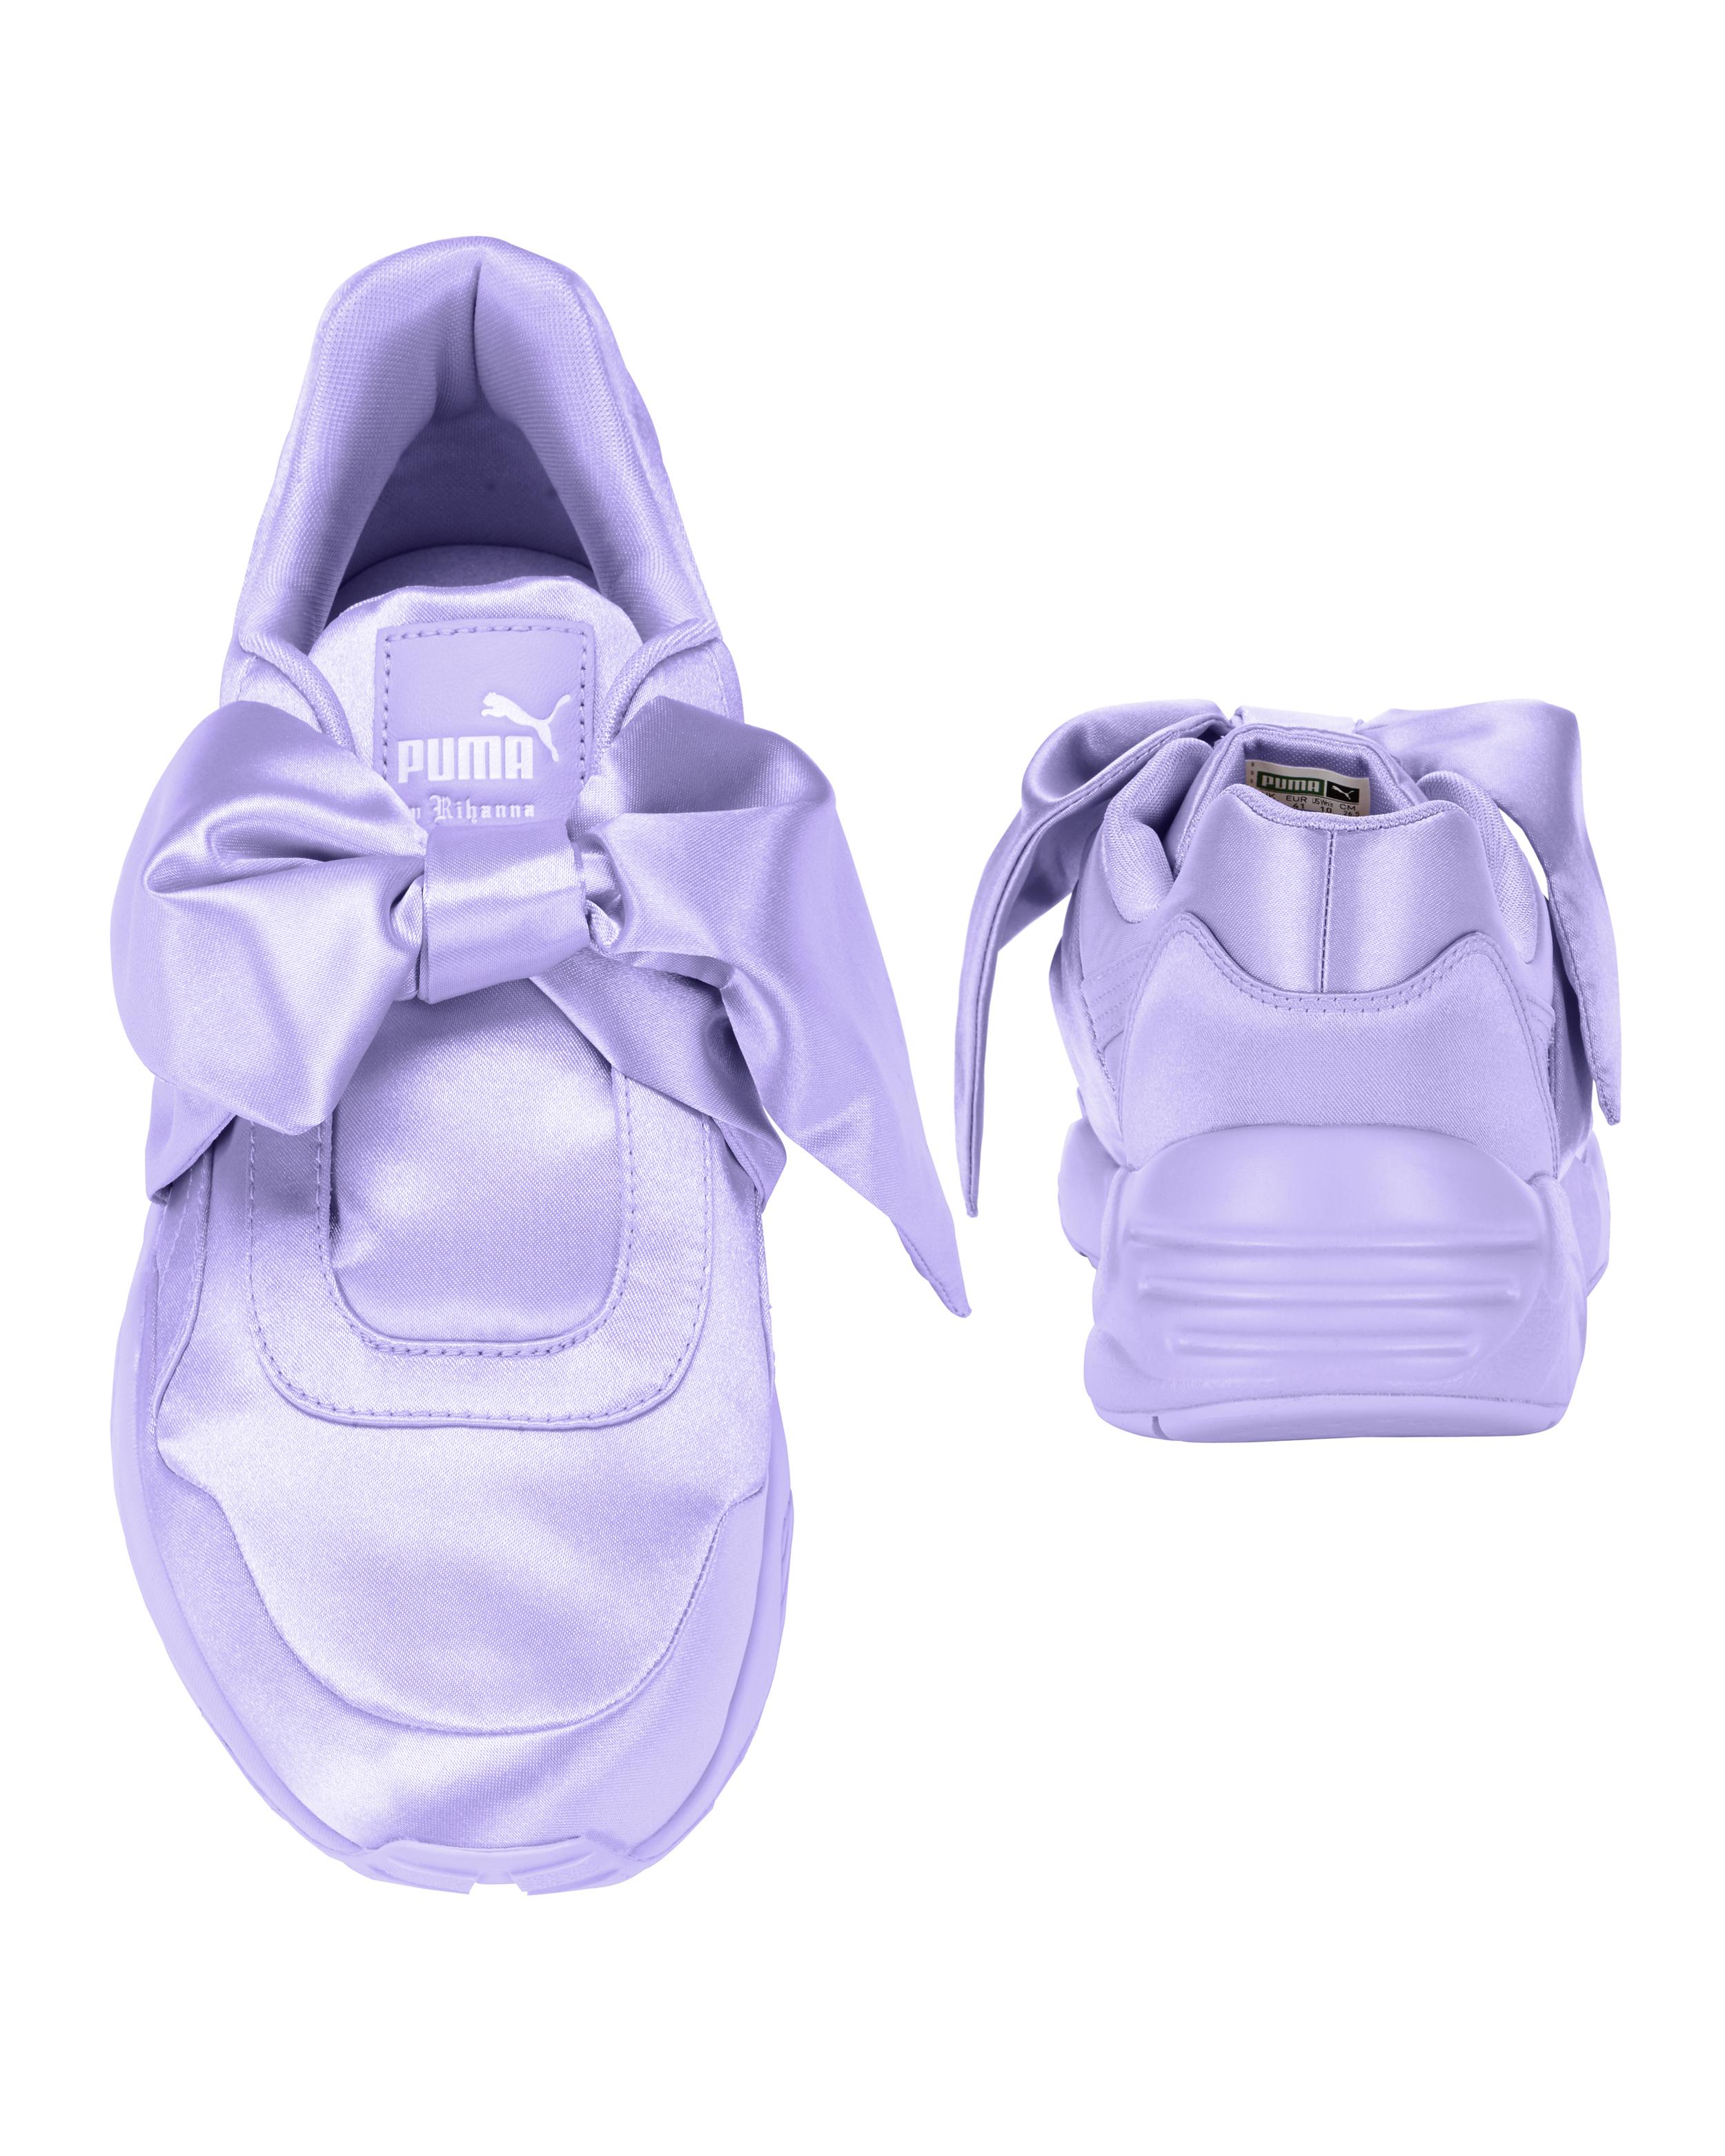 los angeles 976d9 d98ee PUMA X FENTY by Rihanna Lavender Bow Sneakers - INTERMIX®